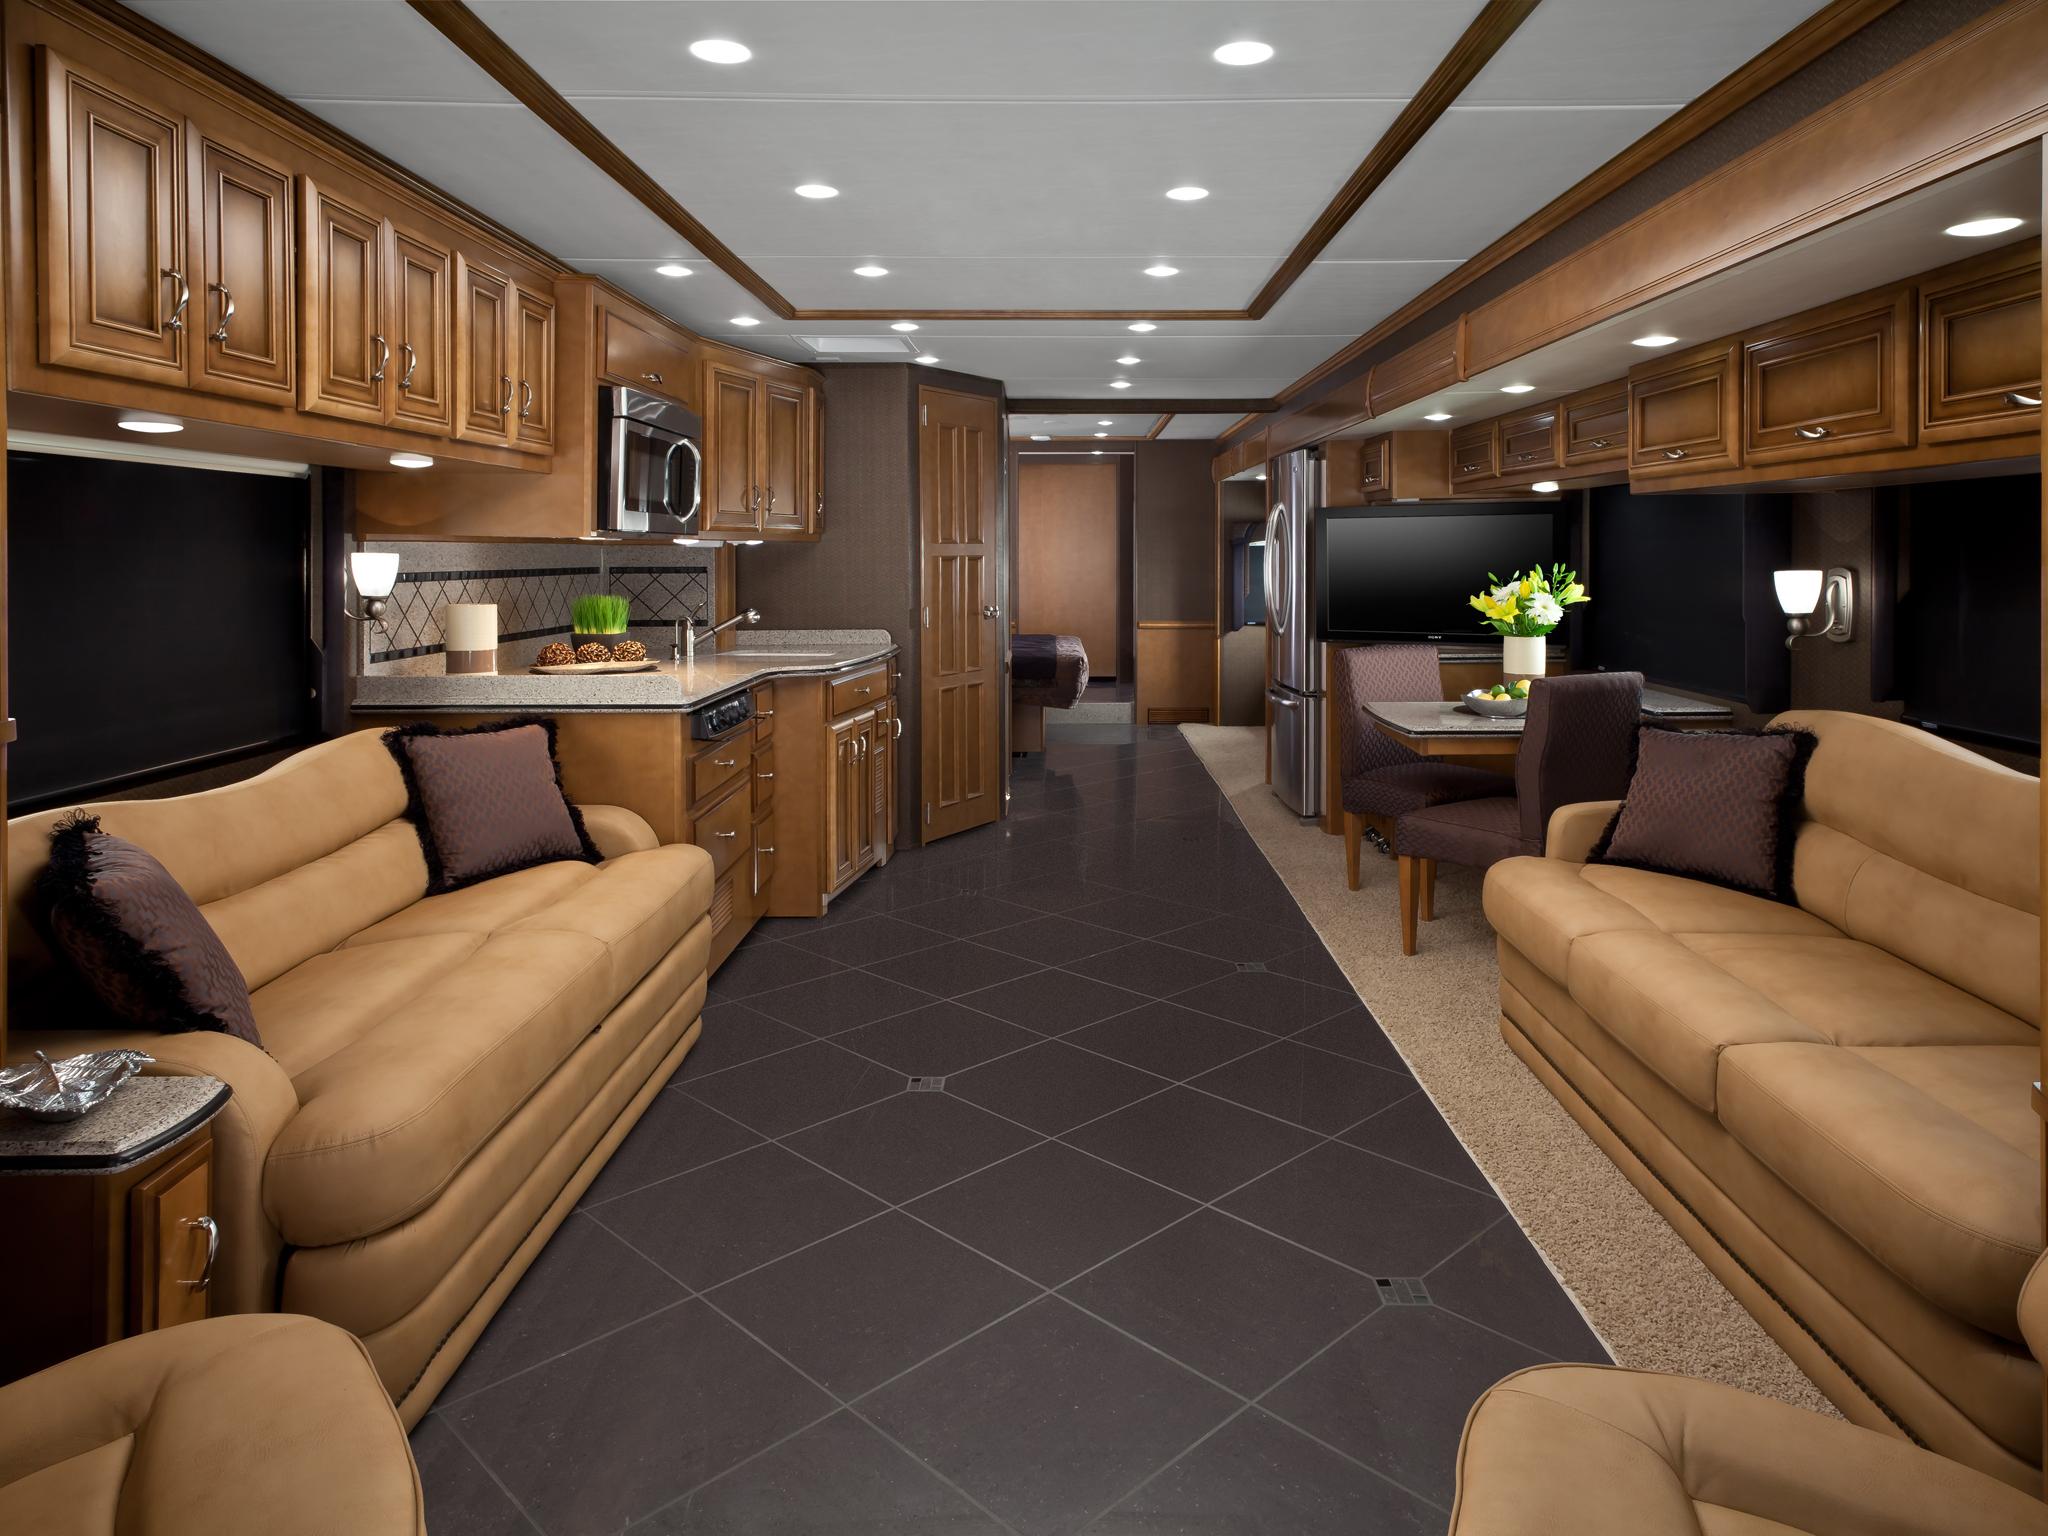 2013 newmar ventana 4346 motorhome camper interior h for Camper interior designs